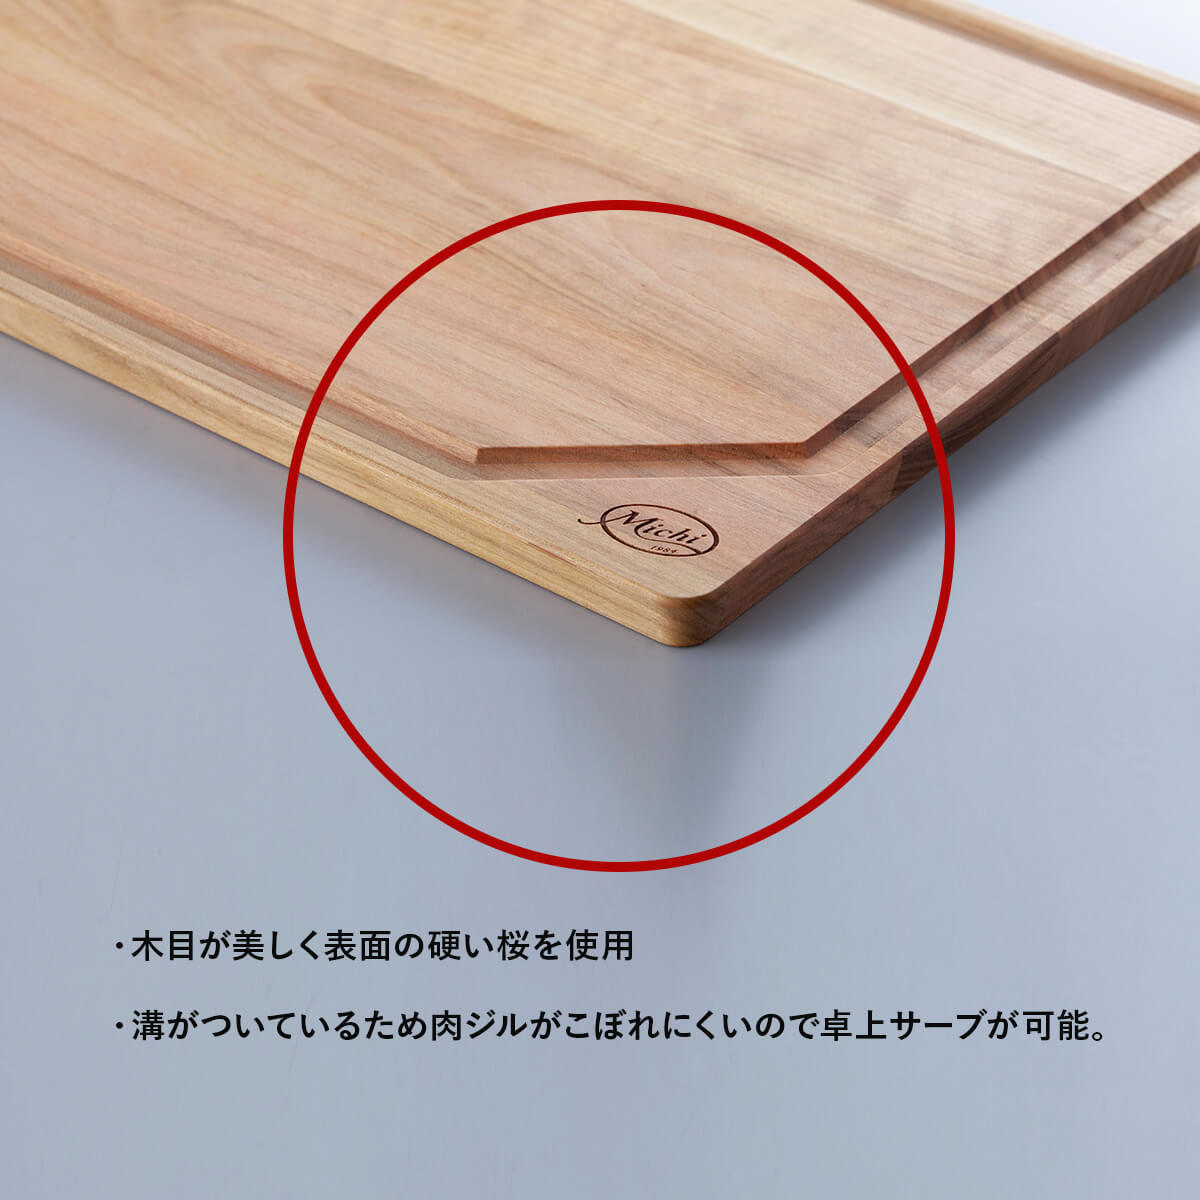 Michi カッティングボード for Meat M | Michi